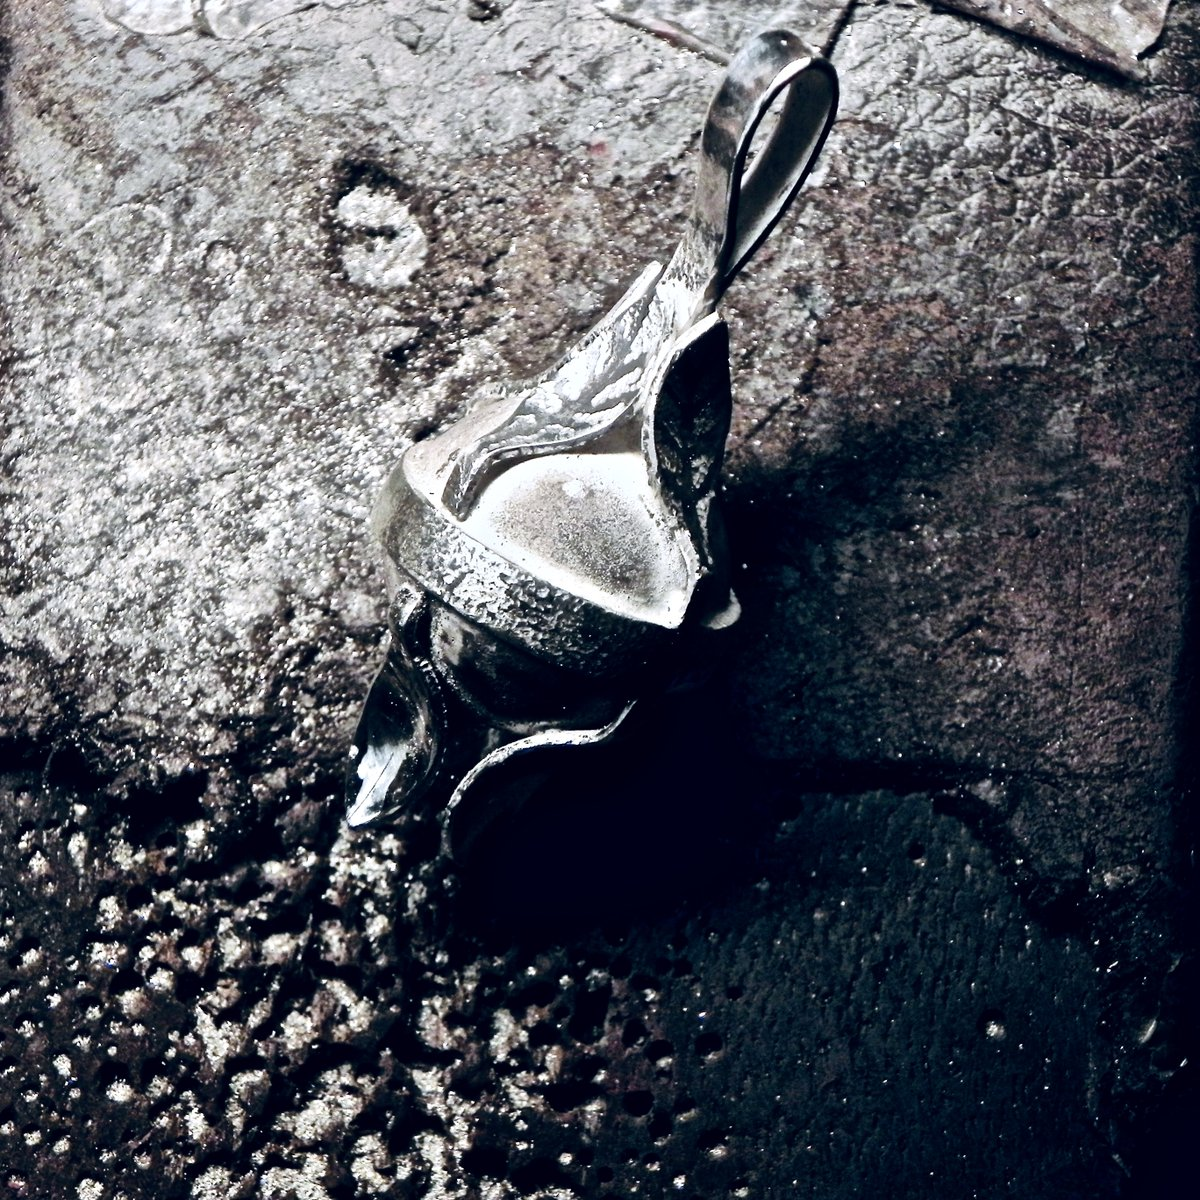 Pre enamelling.  #Silver #jewellery #jewelry  #jewelrydesign  #jewelrydesigner  #jewelryaddict #sterlingsilver  #originalart #craftspeople #handmade #handmadewithlove #handmadejewellery #handmadejewelry #originaldesign #spring #silver